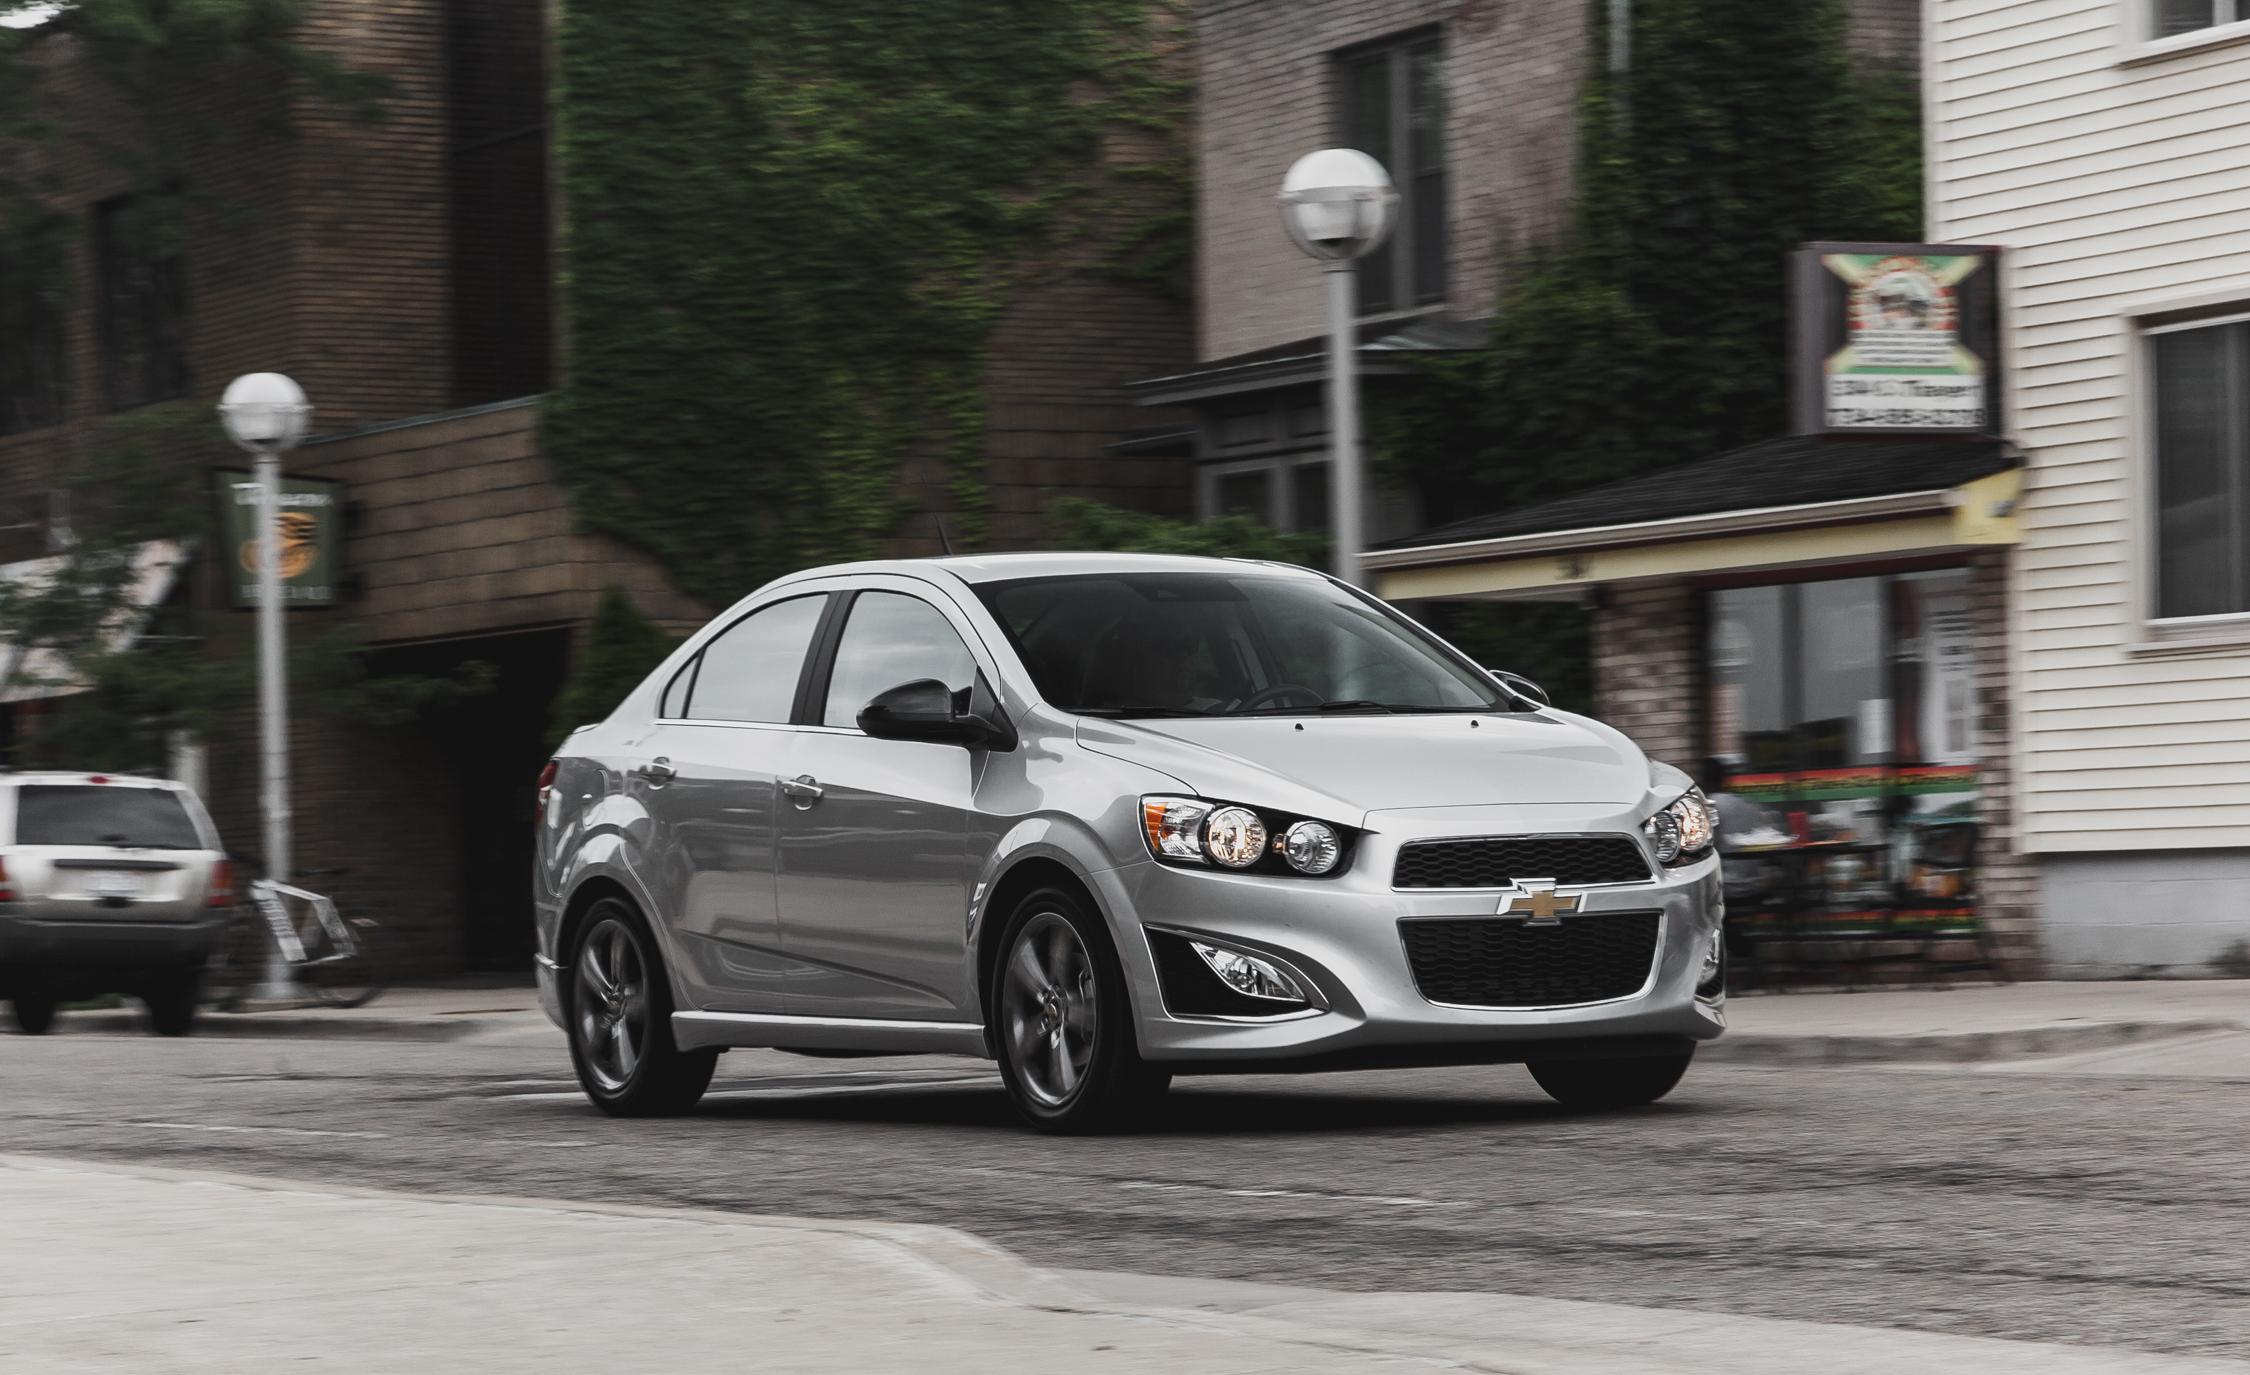 2014 Chevrolet Sonic RS Sedan (Photo 11 of 27)